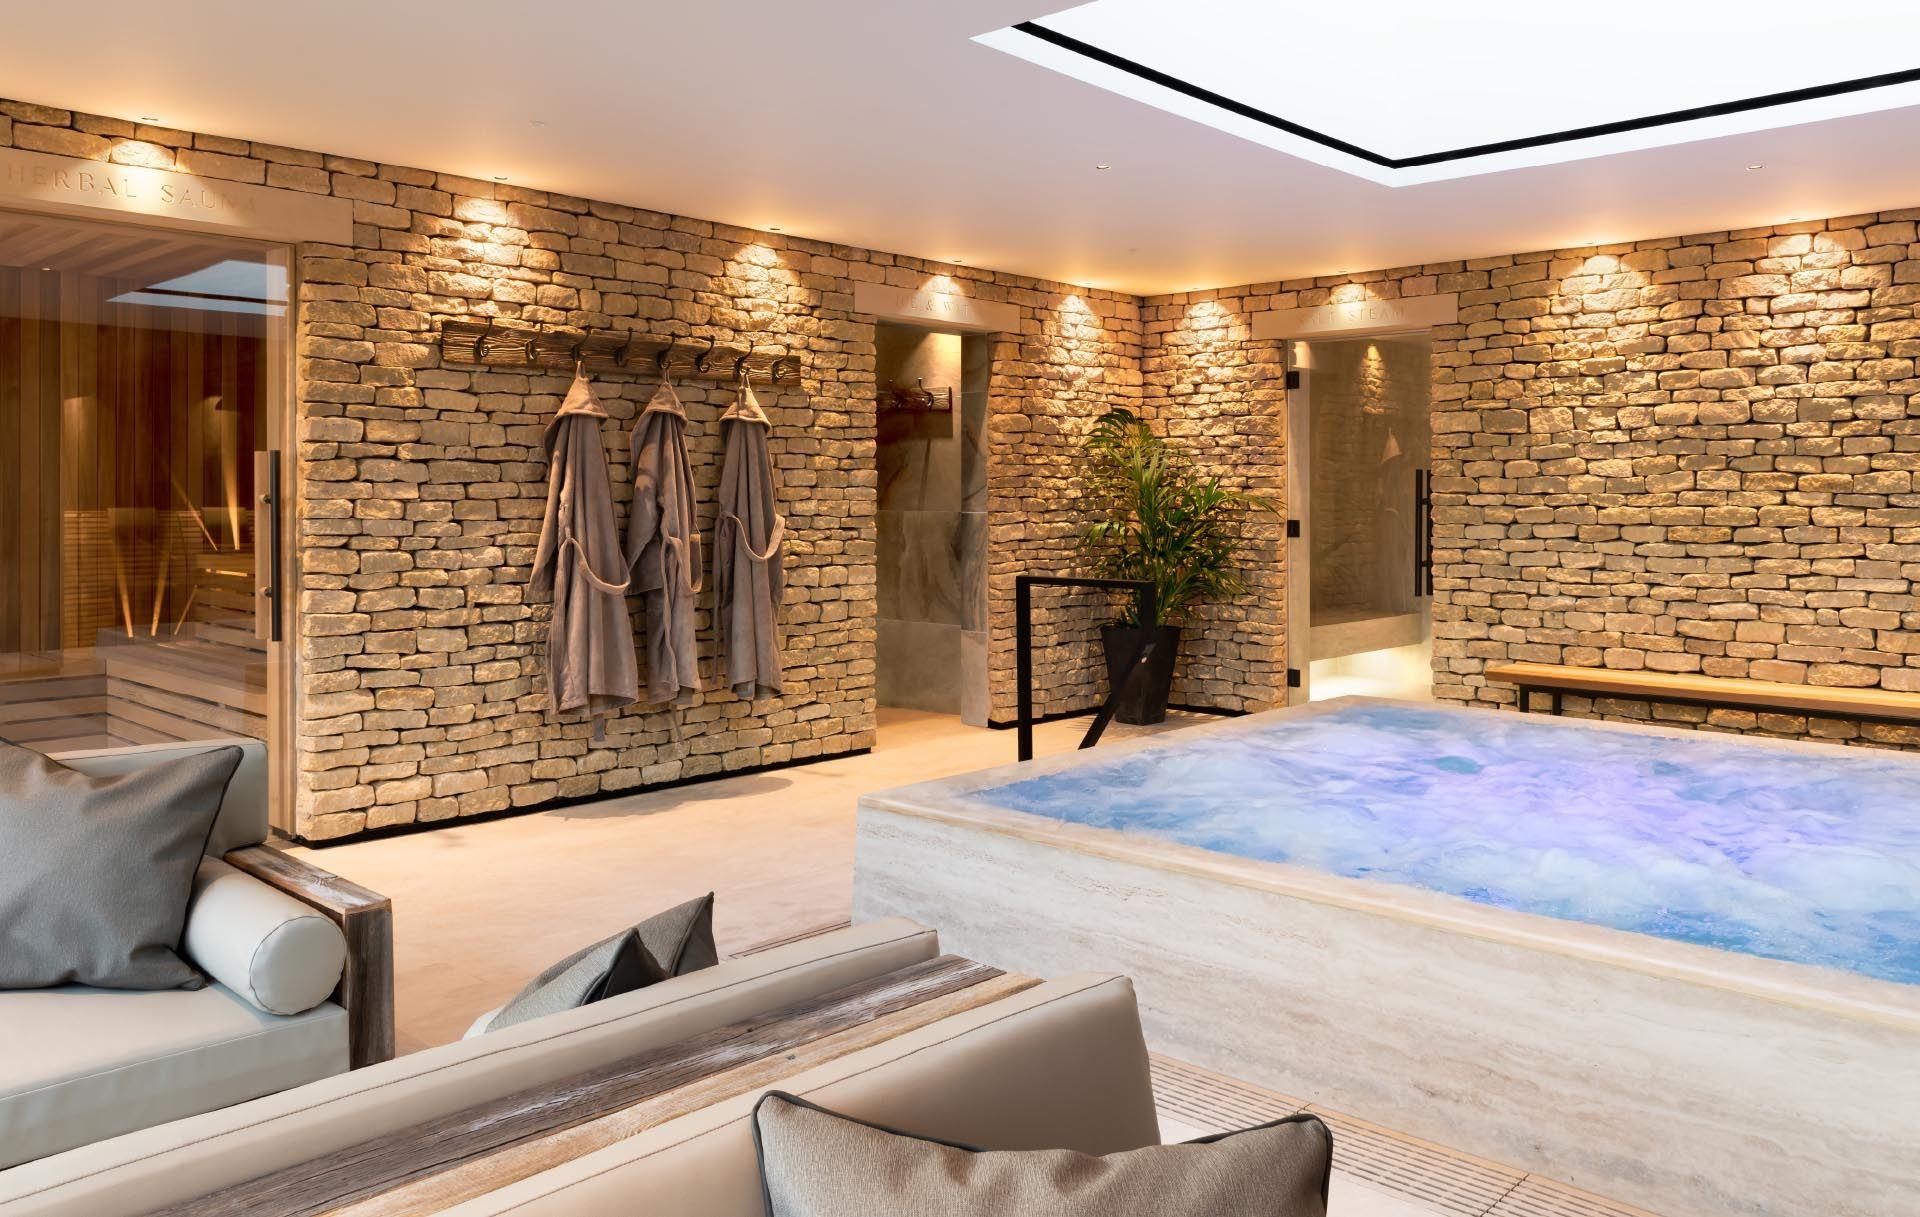 Homefield Grange Wellness Spa Butterscotch Spa Interior Design Indoor Pool Design Luxury Spa Design